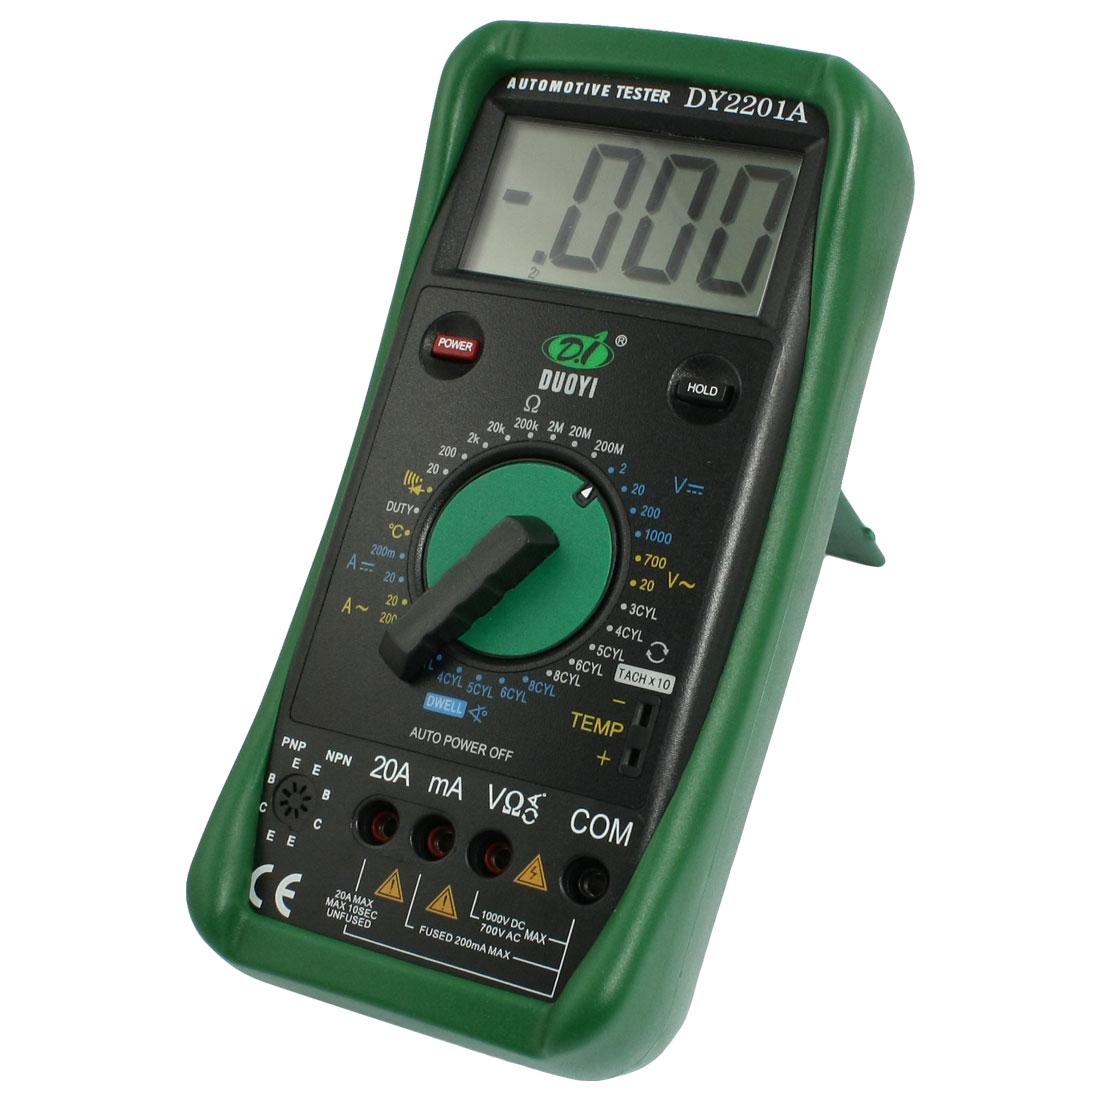 AC DC Voltmeter Ammeter Ohmmeter DY2201 Digital Multimeter